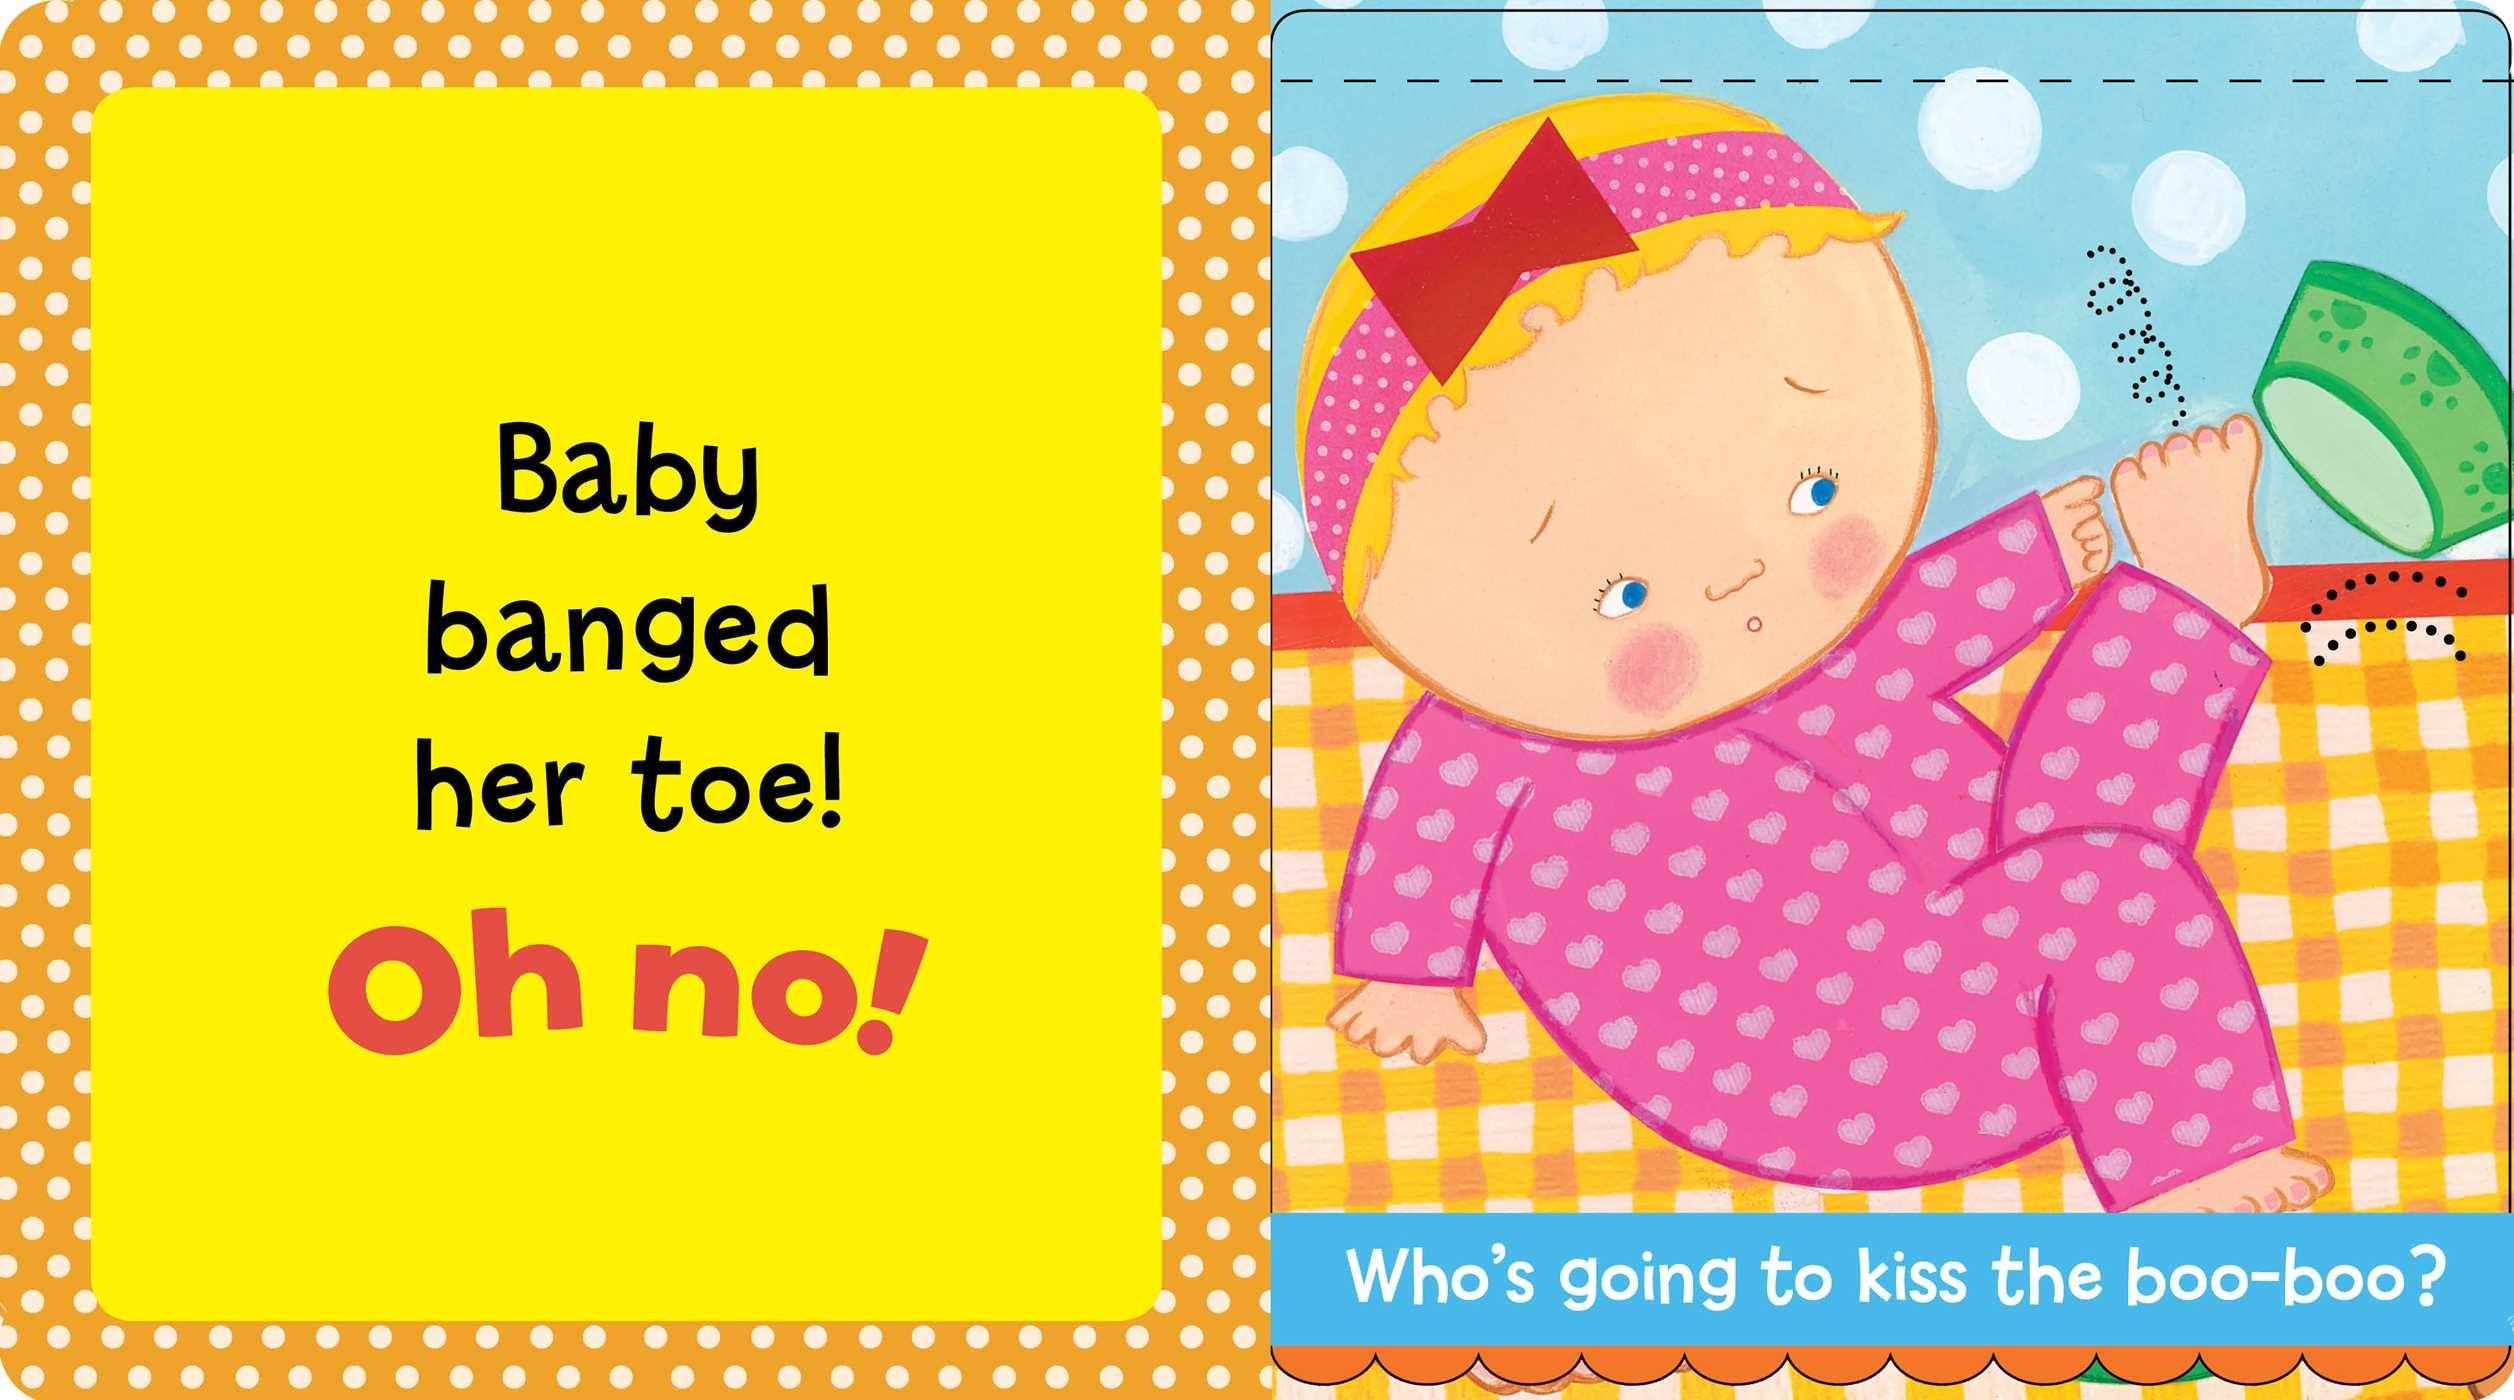 Kiss babys boo boo 9781481442084.in03